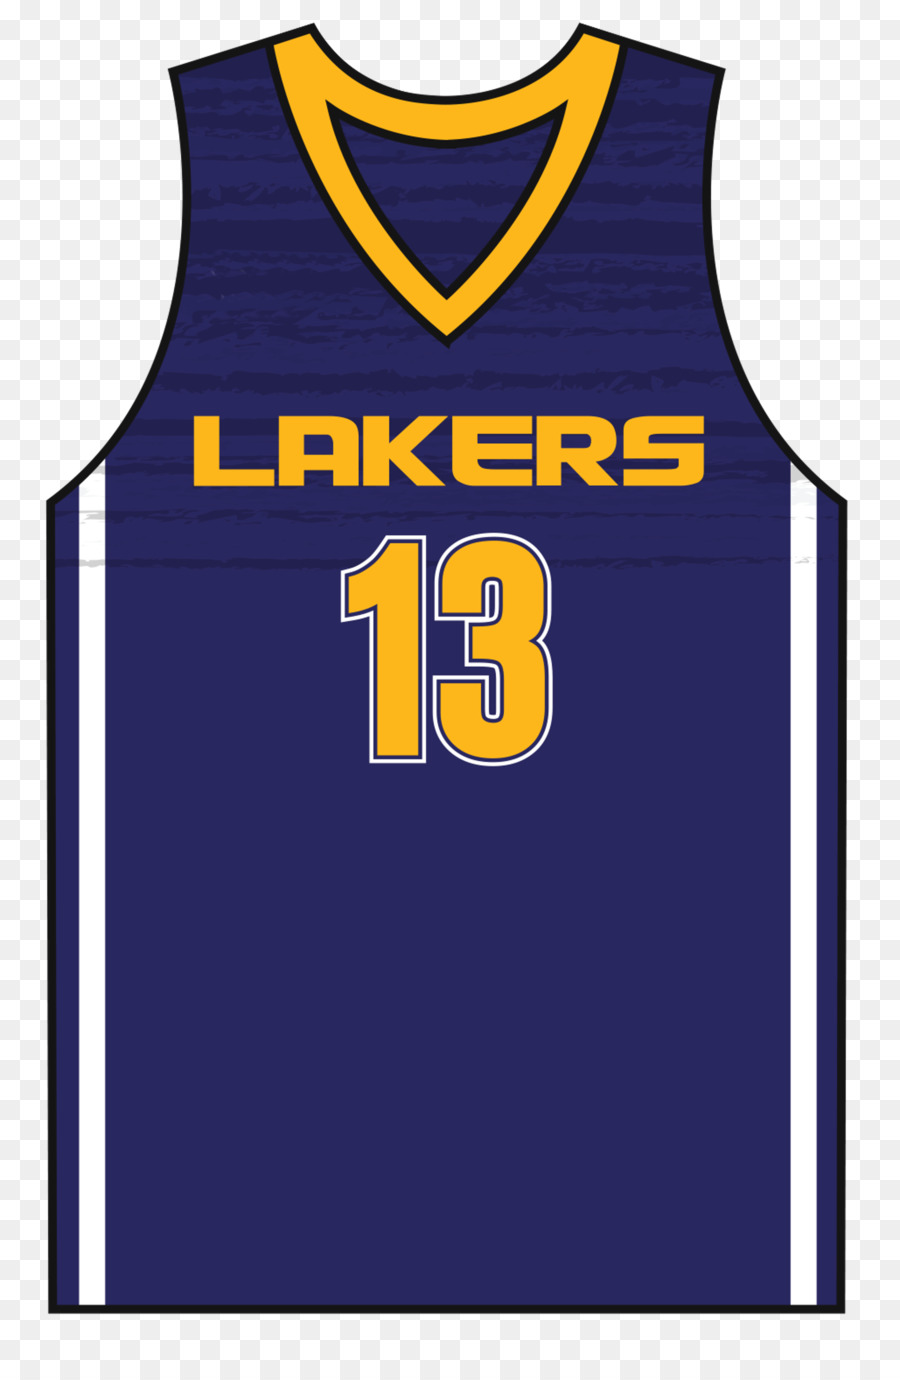 Los Angeles Lakers T-shirt Basketball uniform Jersey - basketball uniform  png download - 1983 3000 - Free Transparent Los Angeles Lakers png Download. 8a86b8081